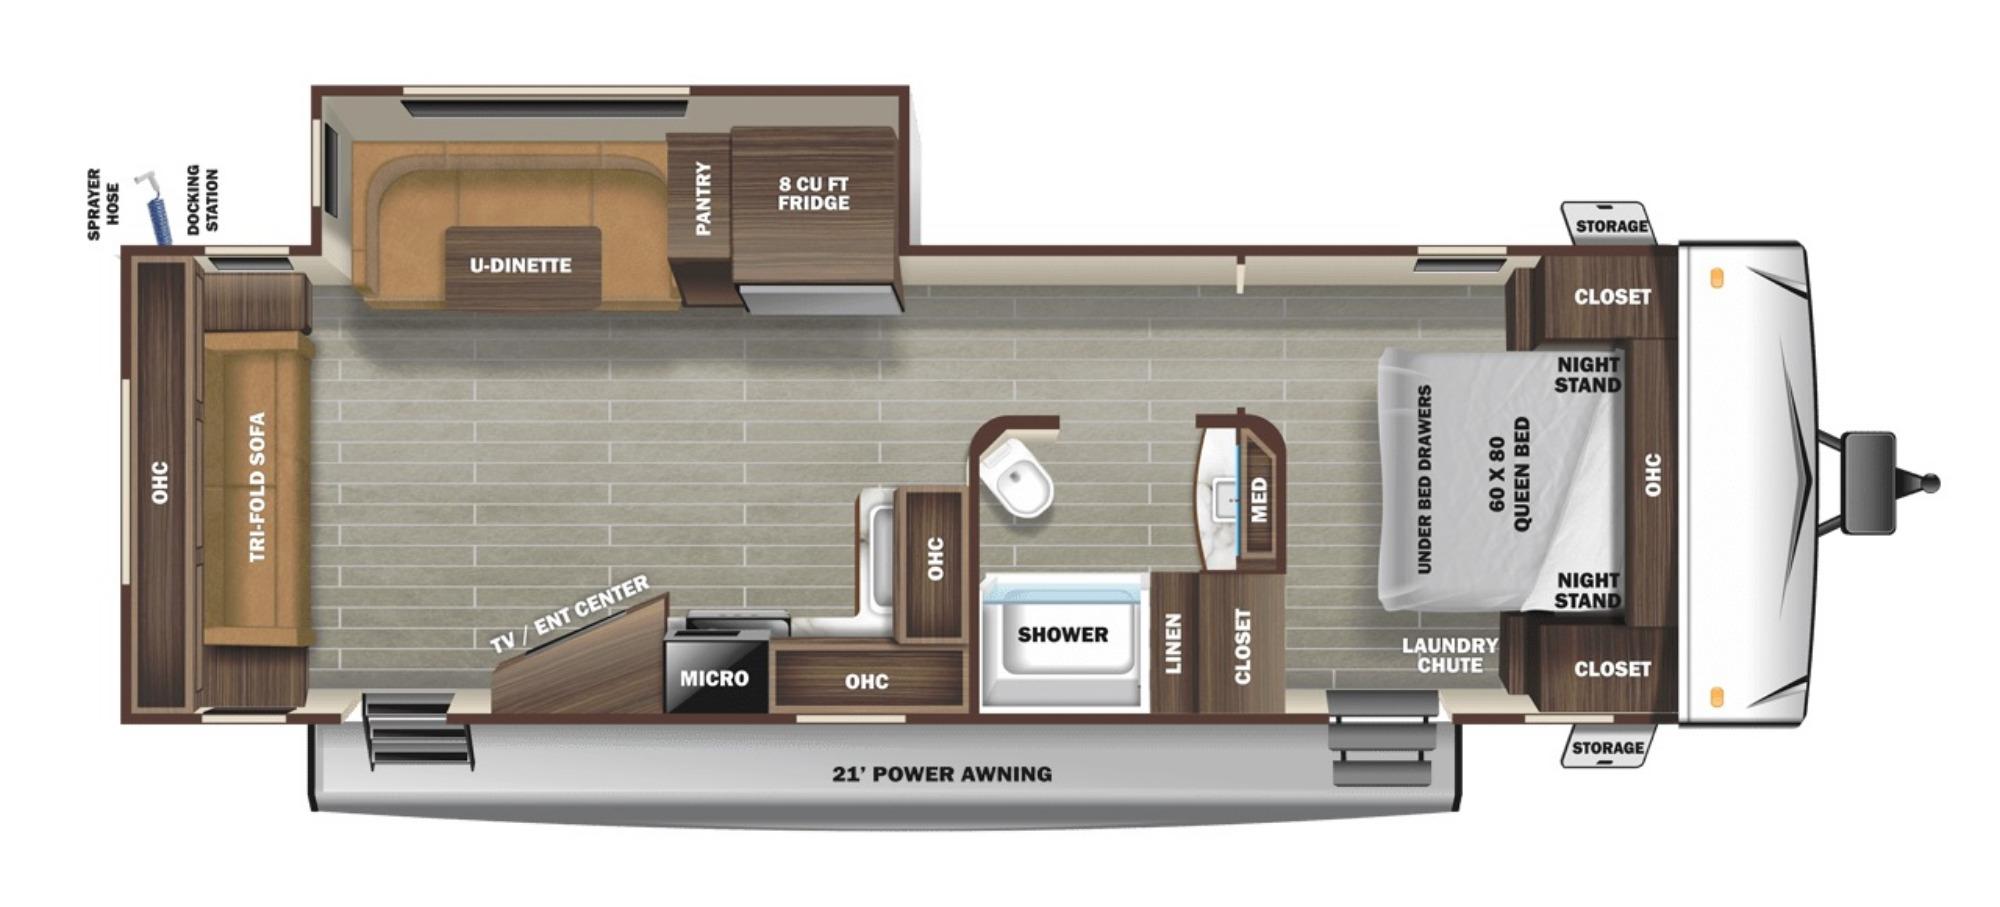 View Floor Plan for 2021 STARCRAFT SUPER LITE 262RL